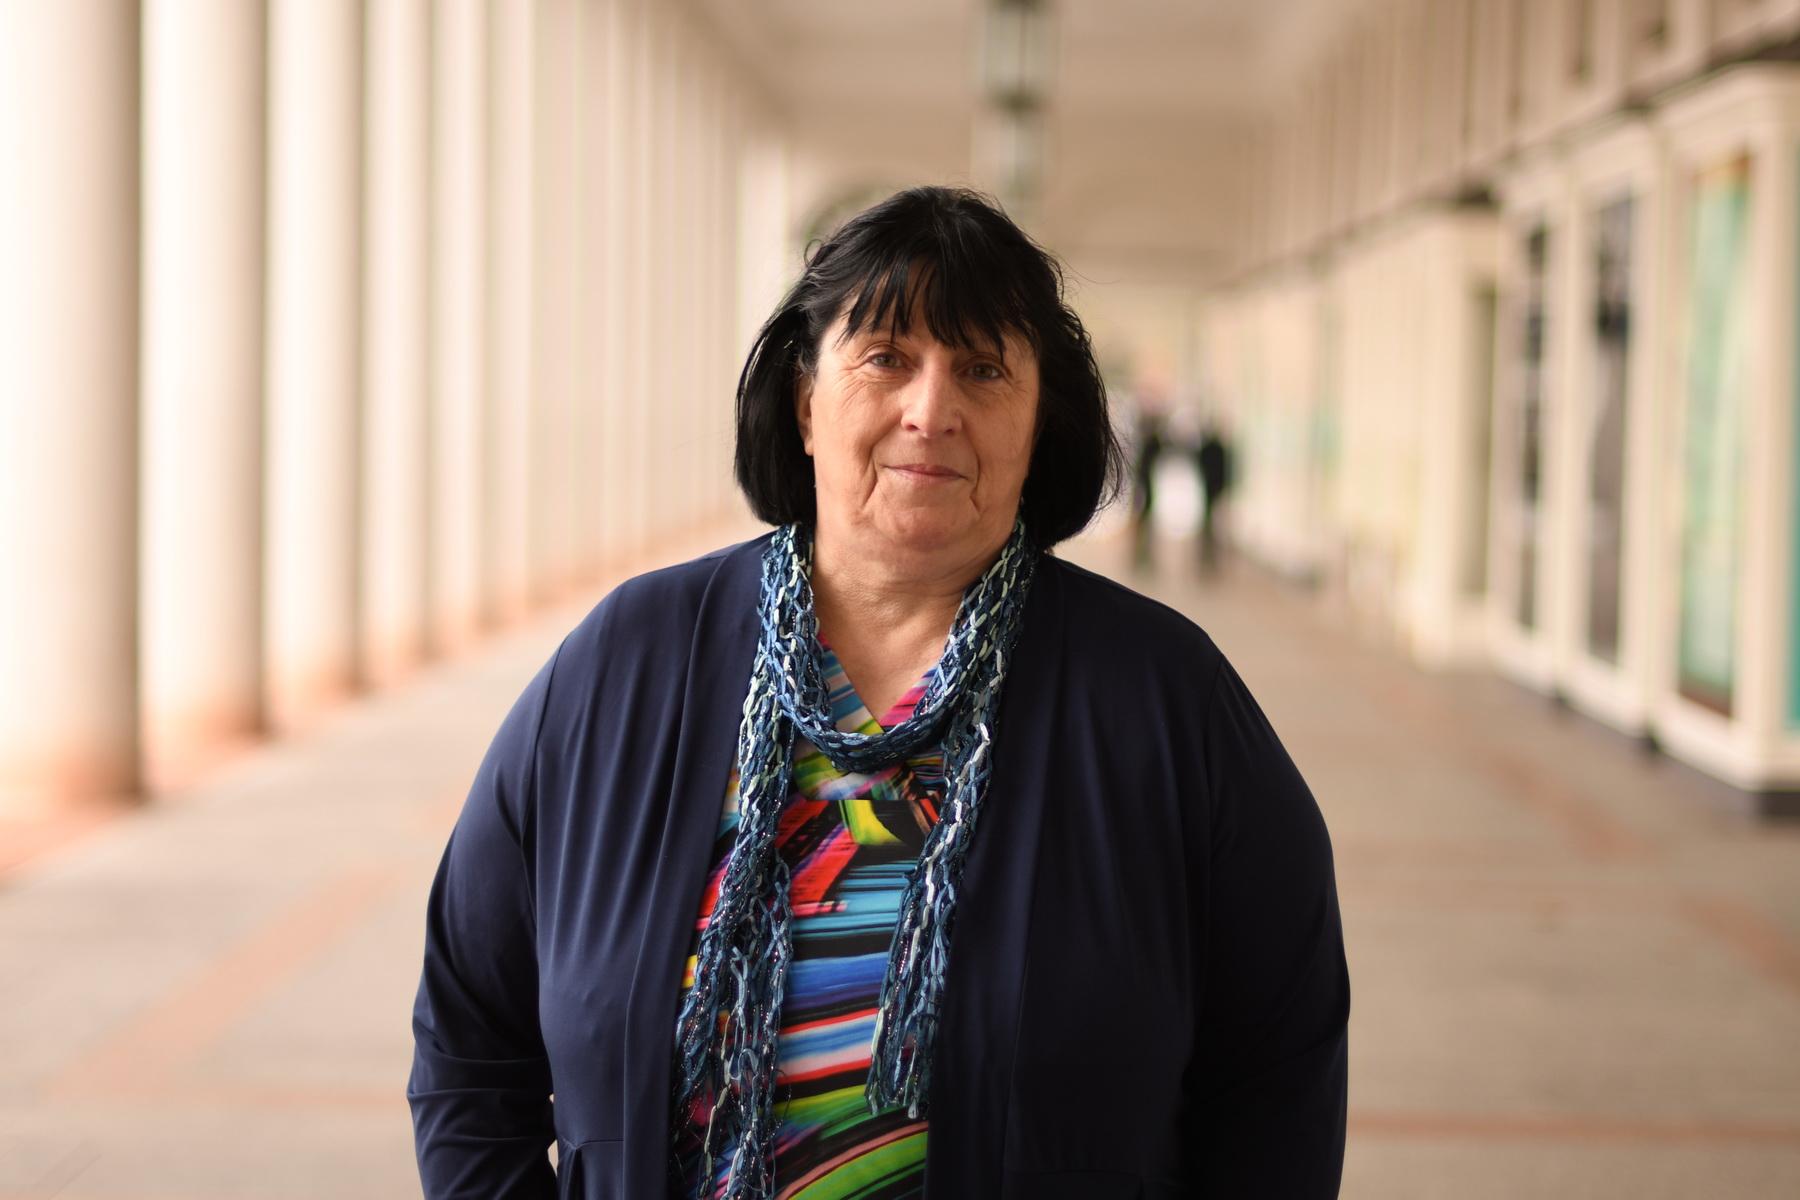 Monika Giesa